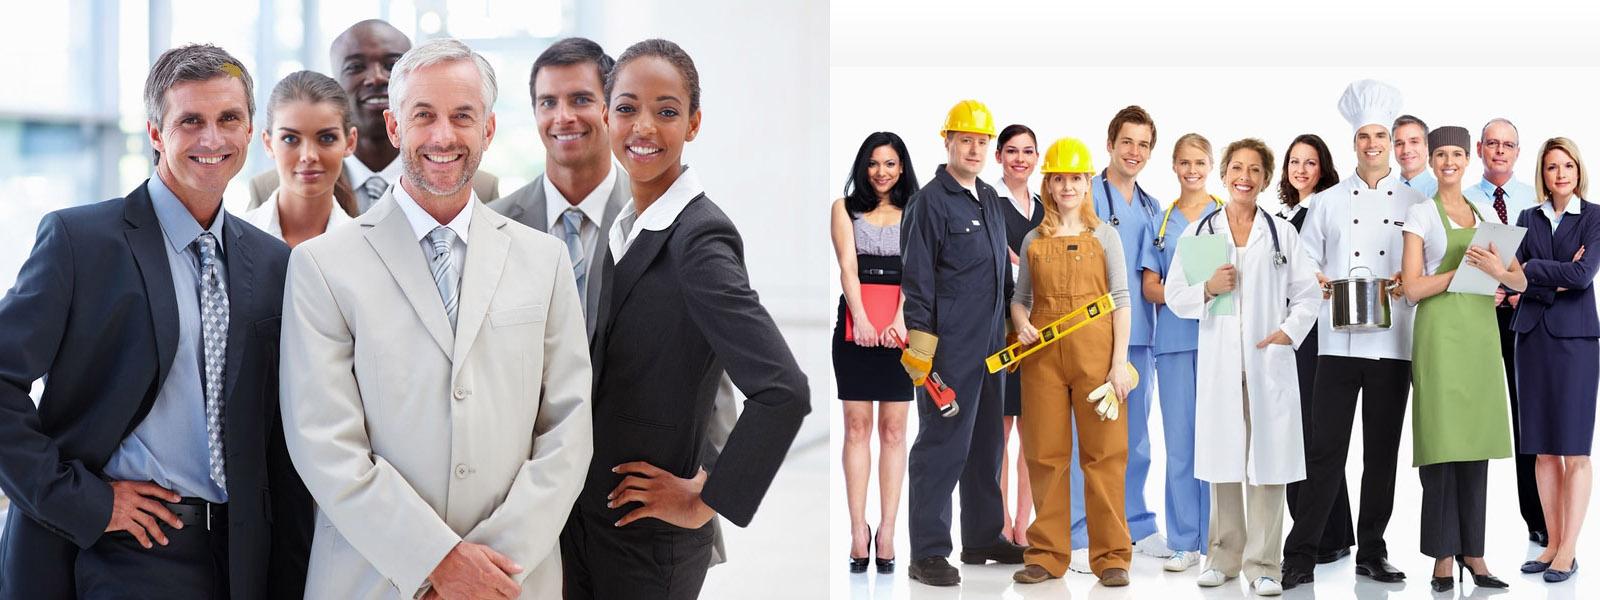 Qué colores elegir para tu uniforme empresarial  e931ea0573ebc